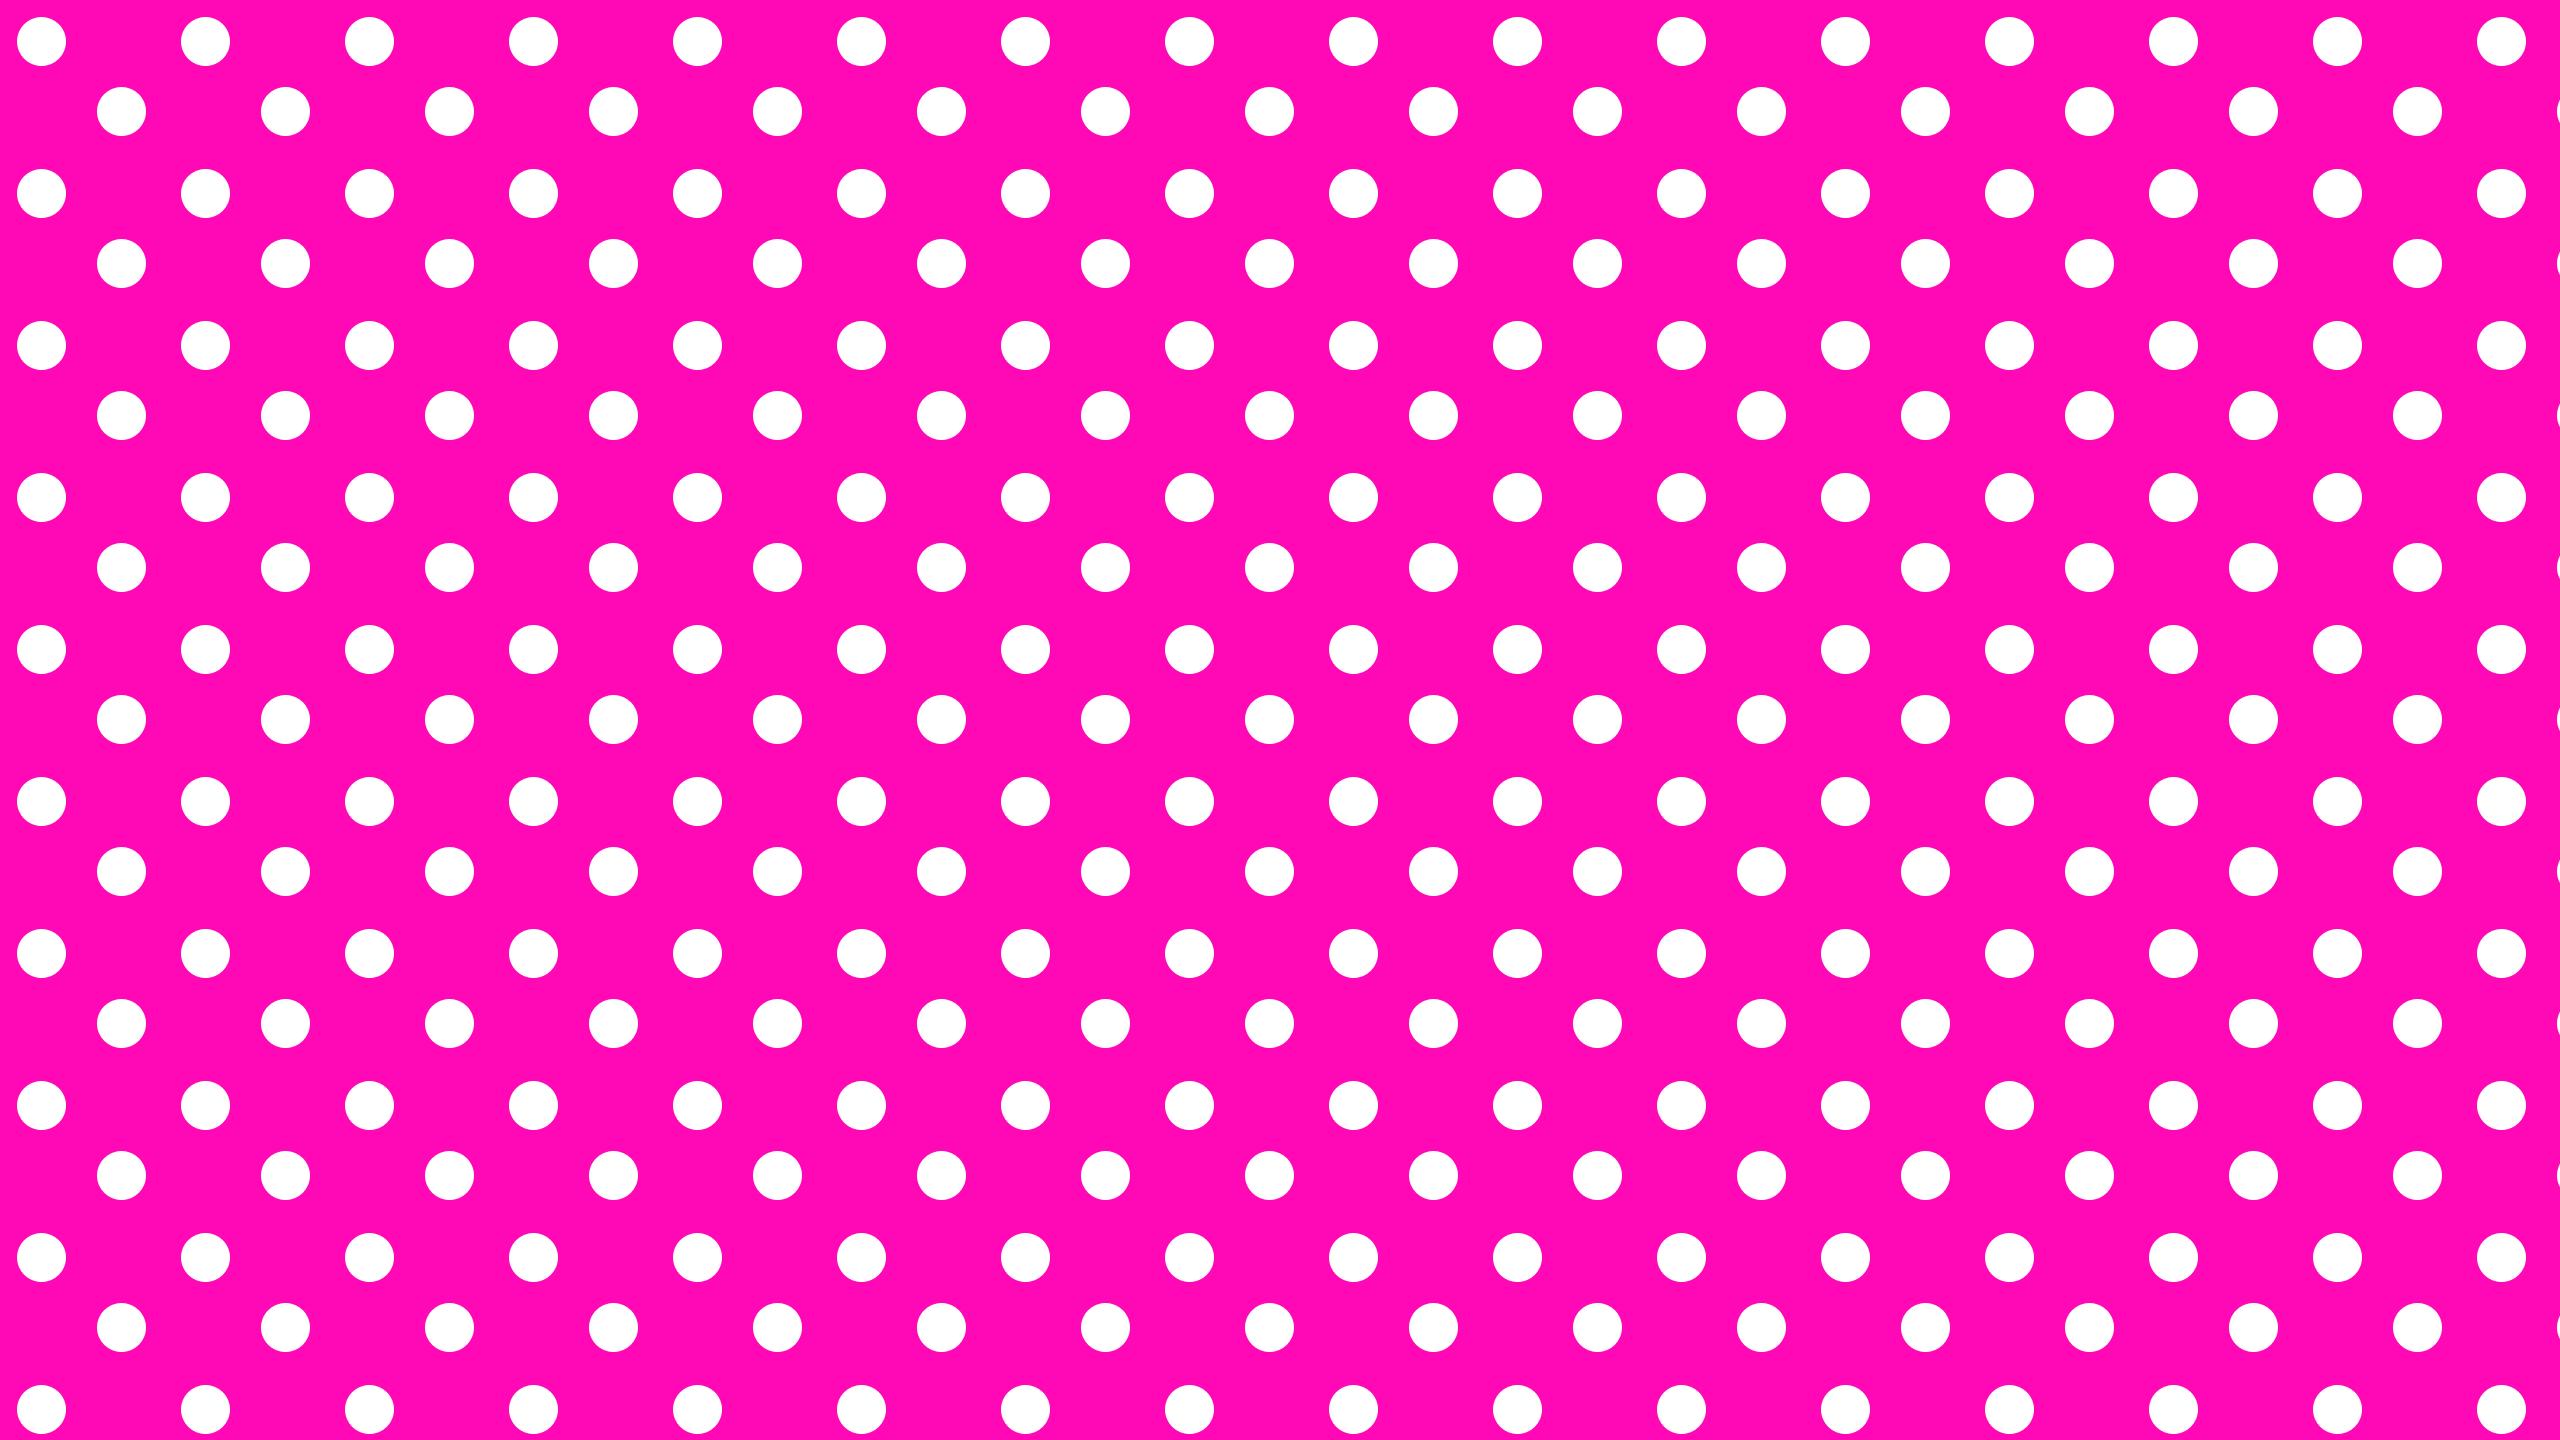 pink desktop large wallpaper wallpapers 2560x1440 2560x1440